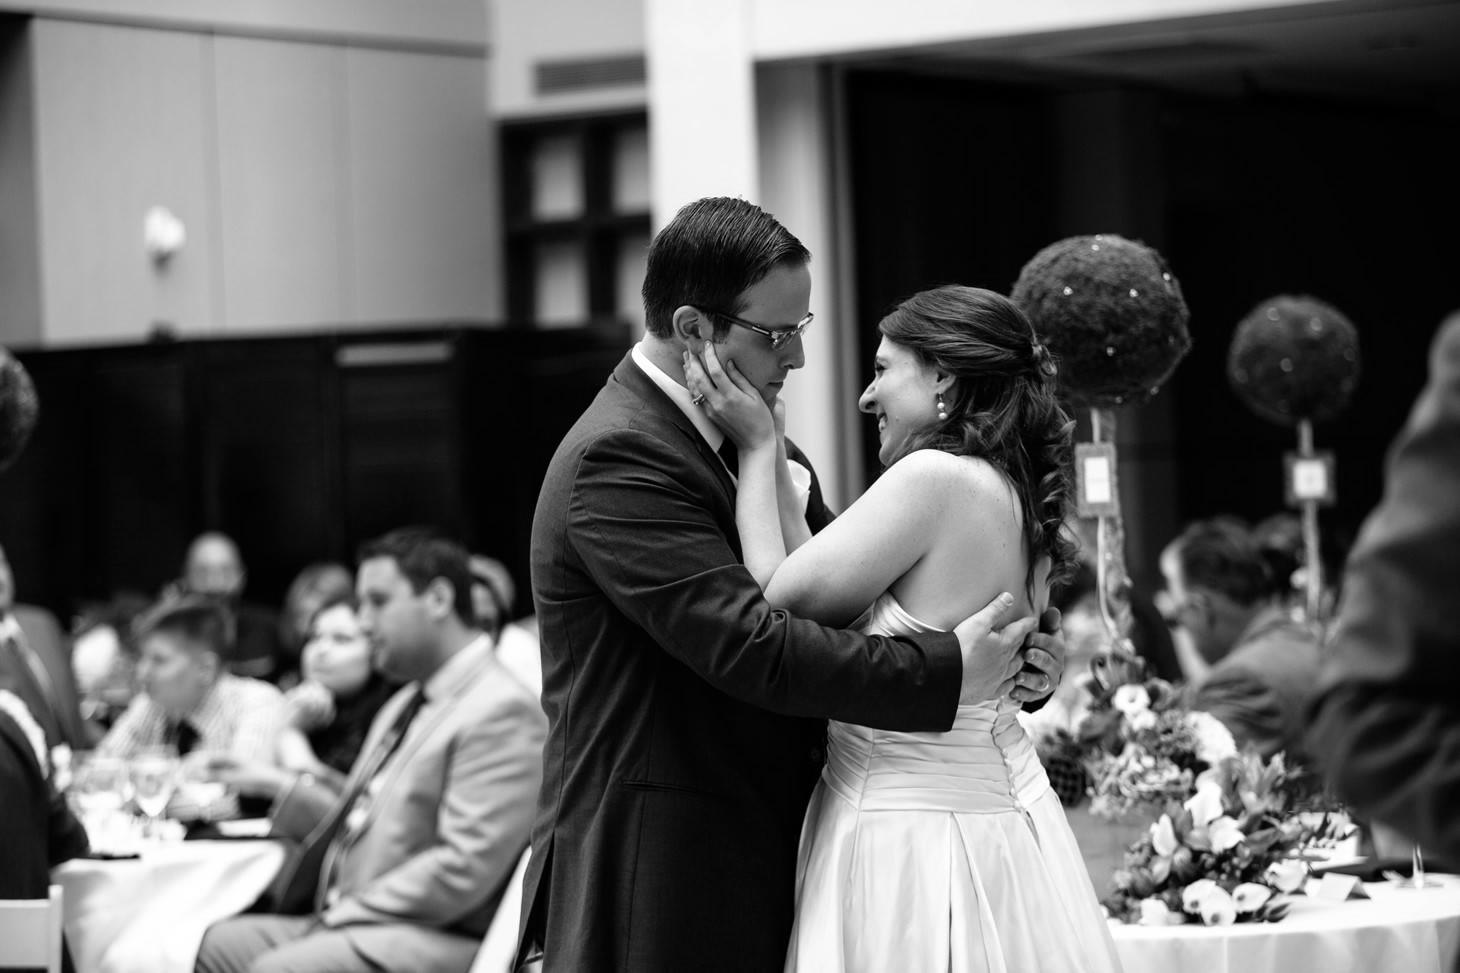 074-nyc-wedding-photographer-hoboken-waterfront-wedding-photos-smitten-chickens.jpg